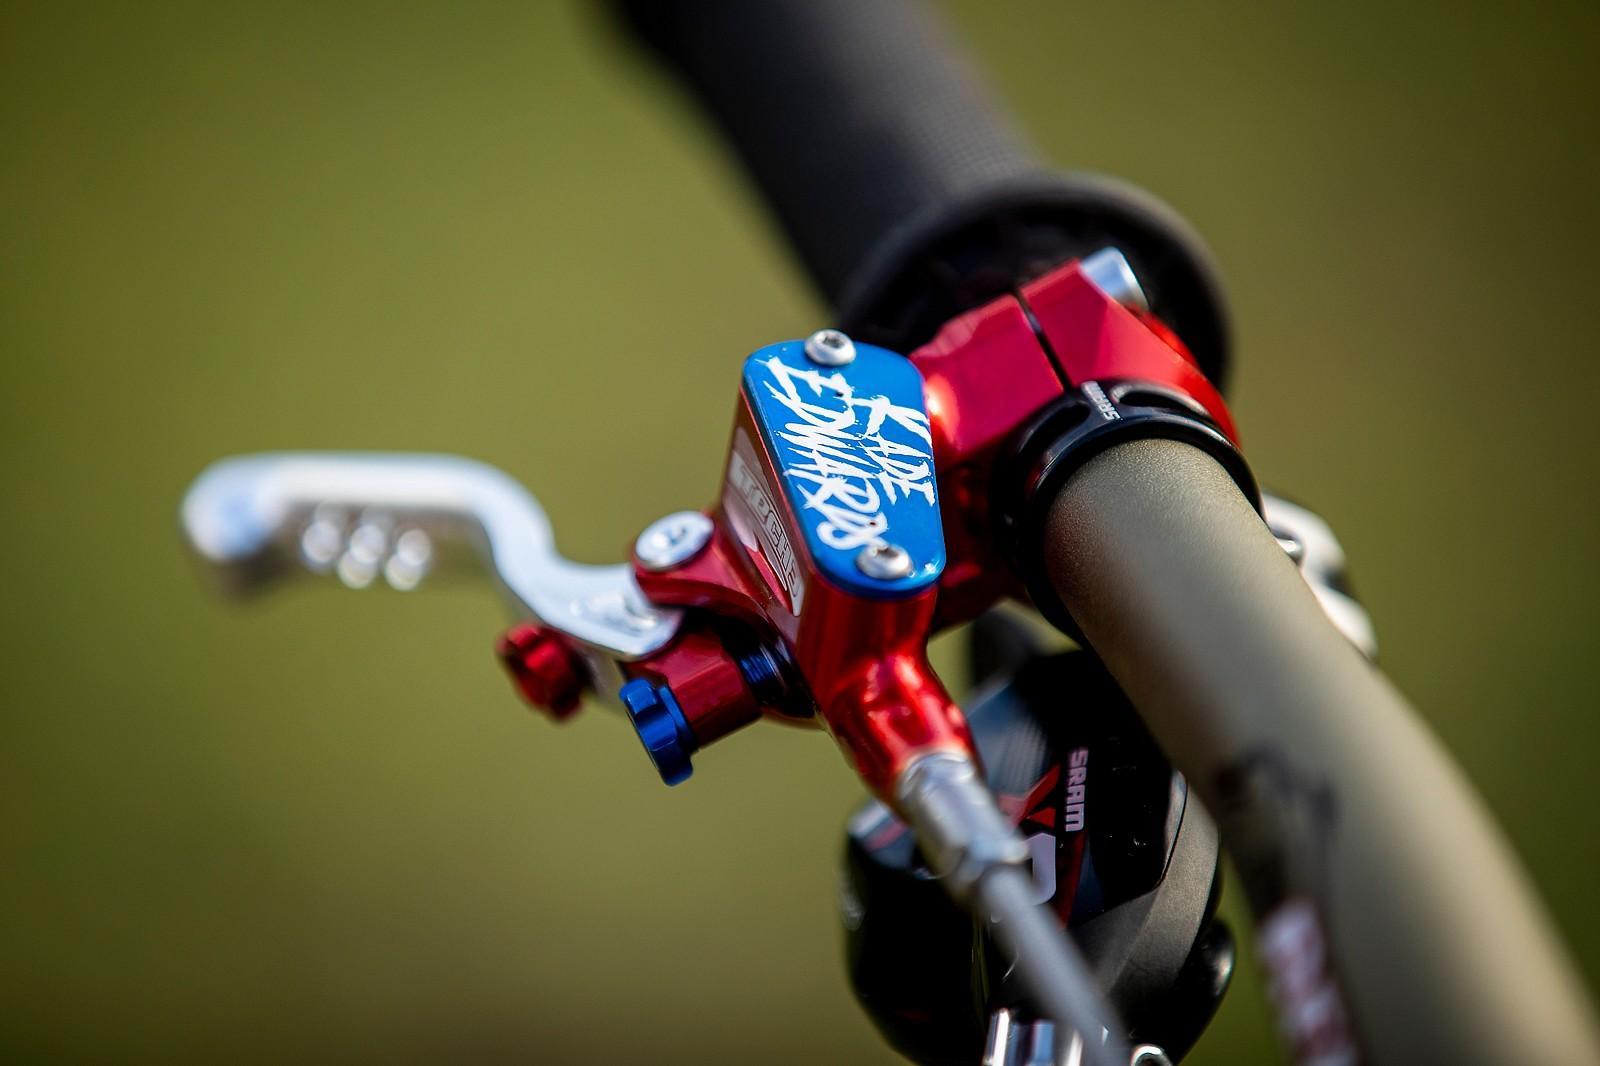 Stop - in the Name of Bling - WORLD CHAMPS BIKE - Kade Edwards' Trek Session - Mountain Biking Pictures - Vital MTB